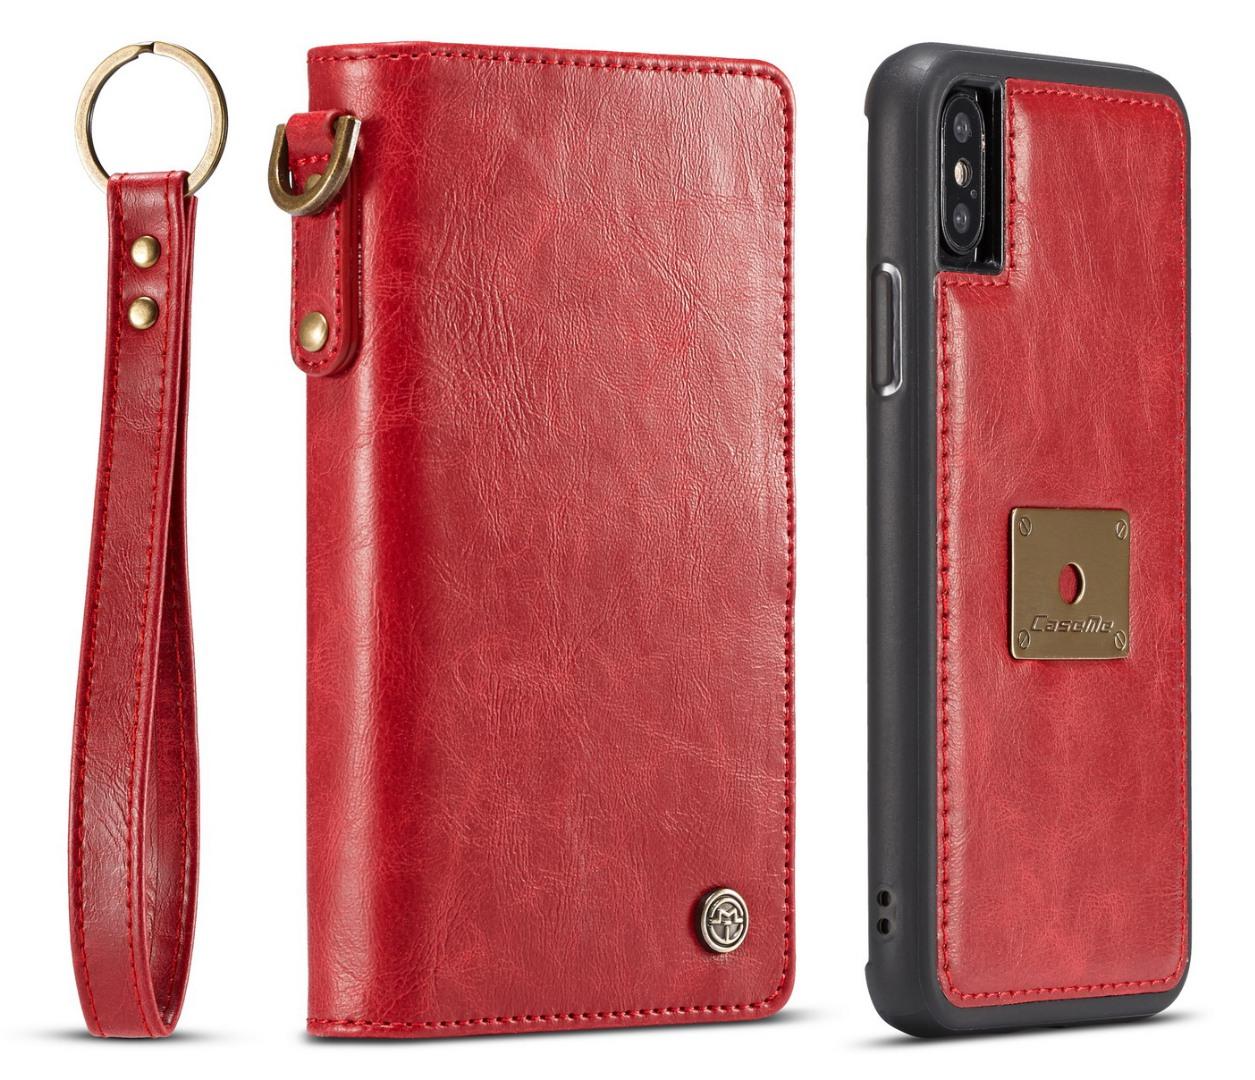 Husa piele portofel, multifunctionala, buzunare carduri, bani, casti, chei, iPhone XS Max - CaseMe, Rosu